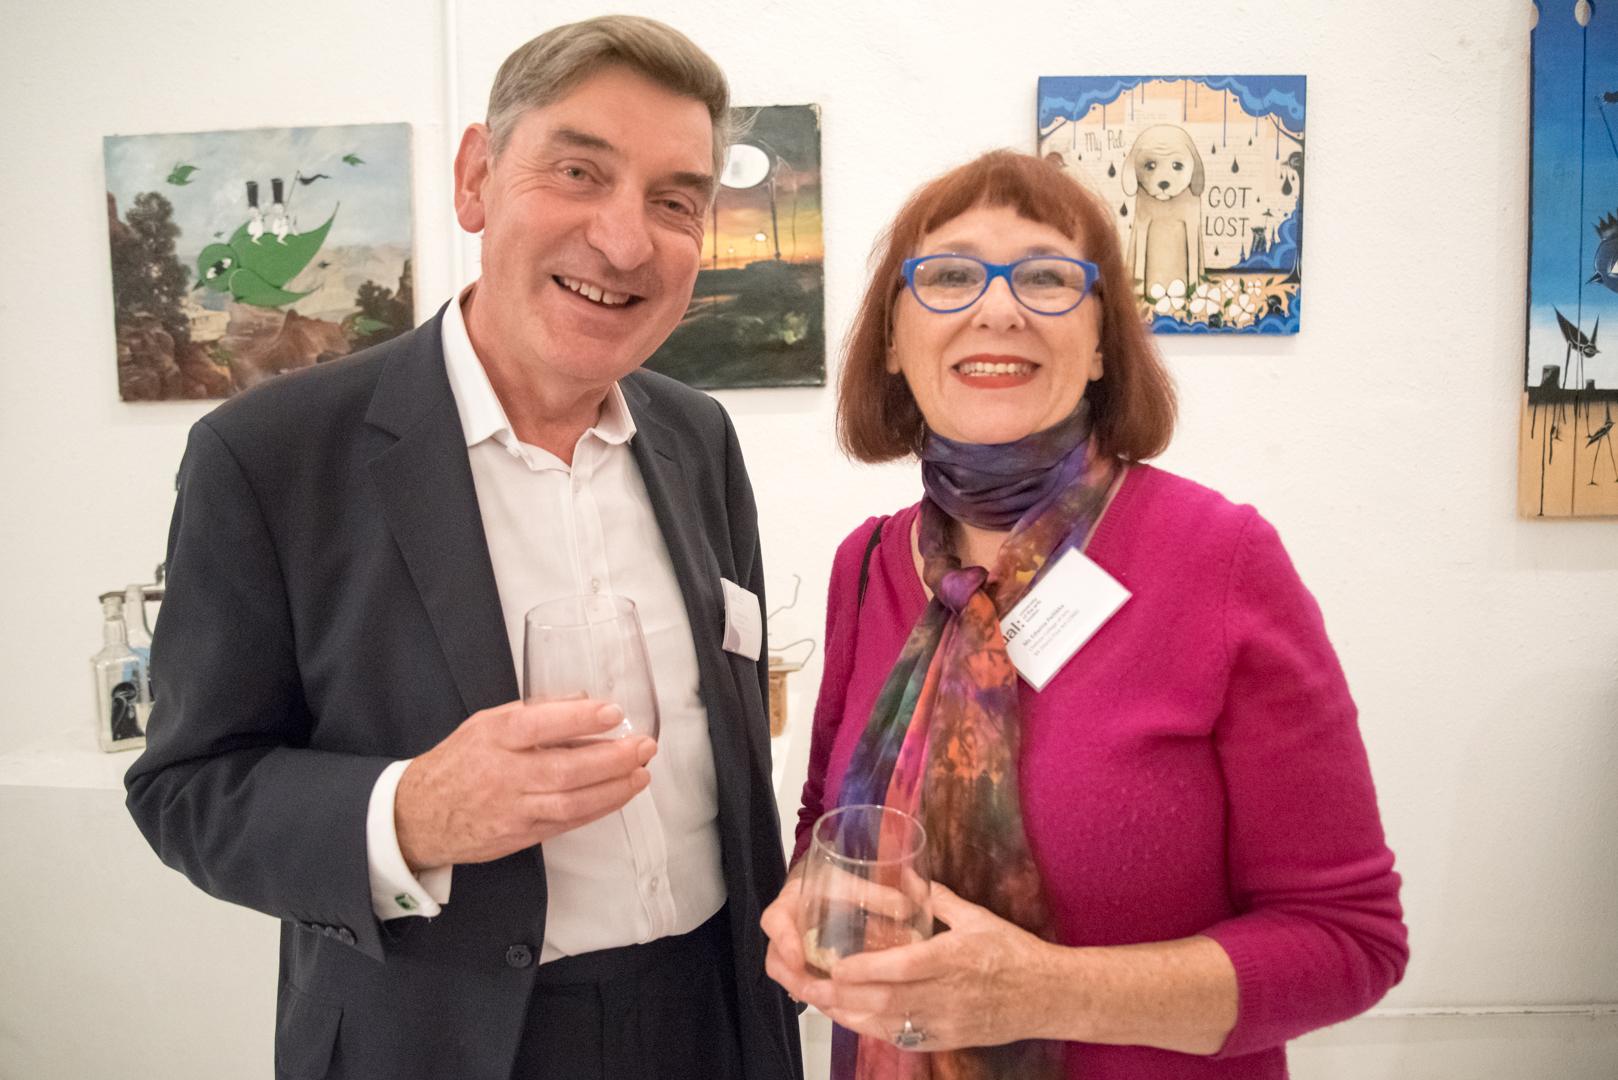 Nigel Carrington and alumna Edwina Pellikka